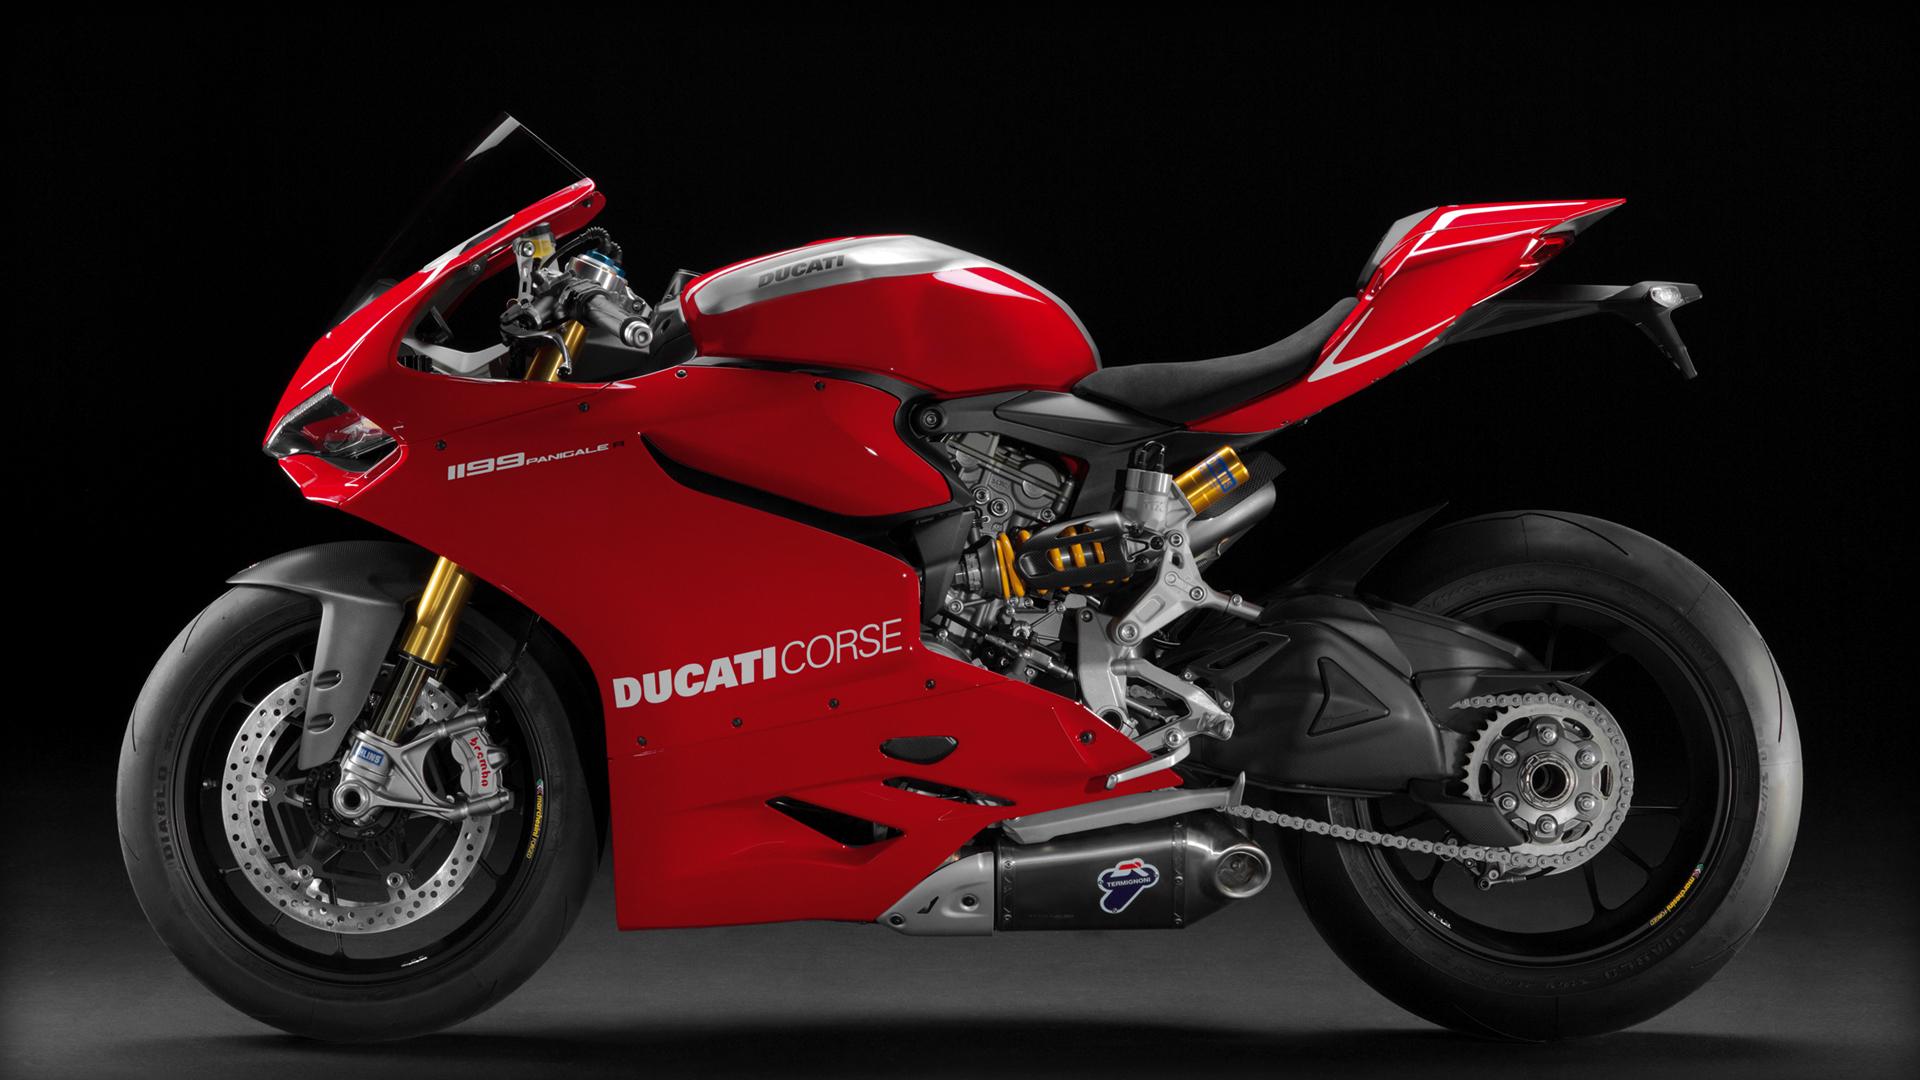 Ducati 1199 Panigale R 1920x1080